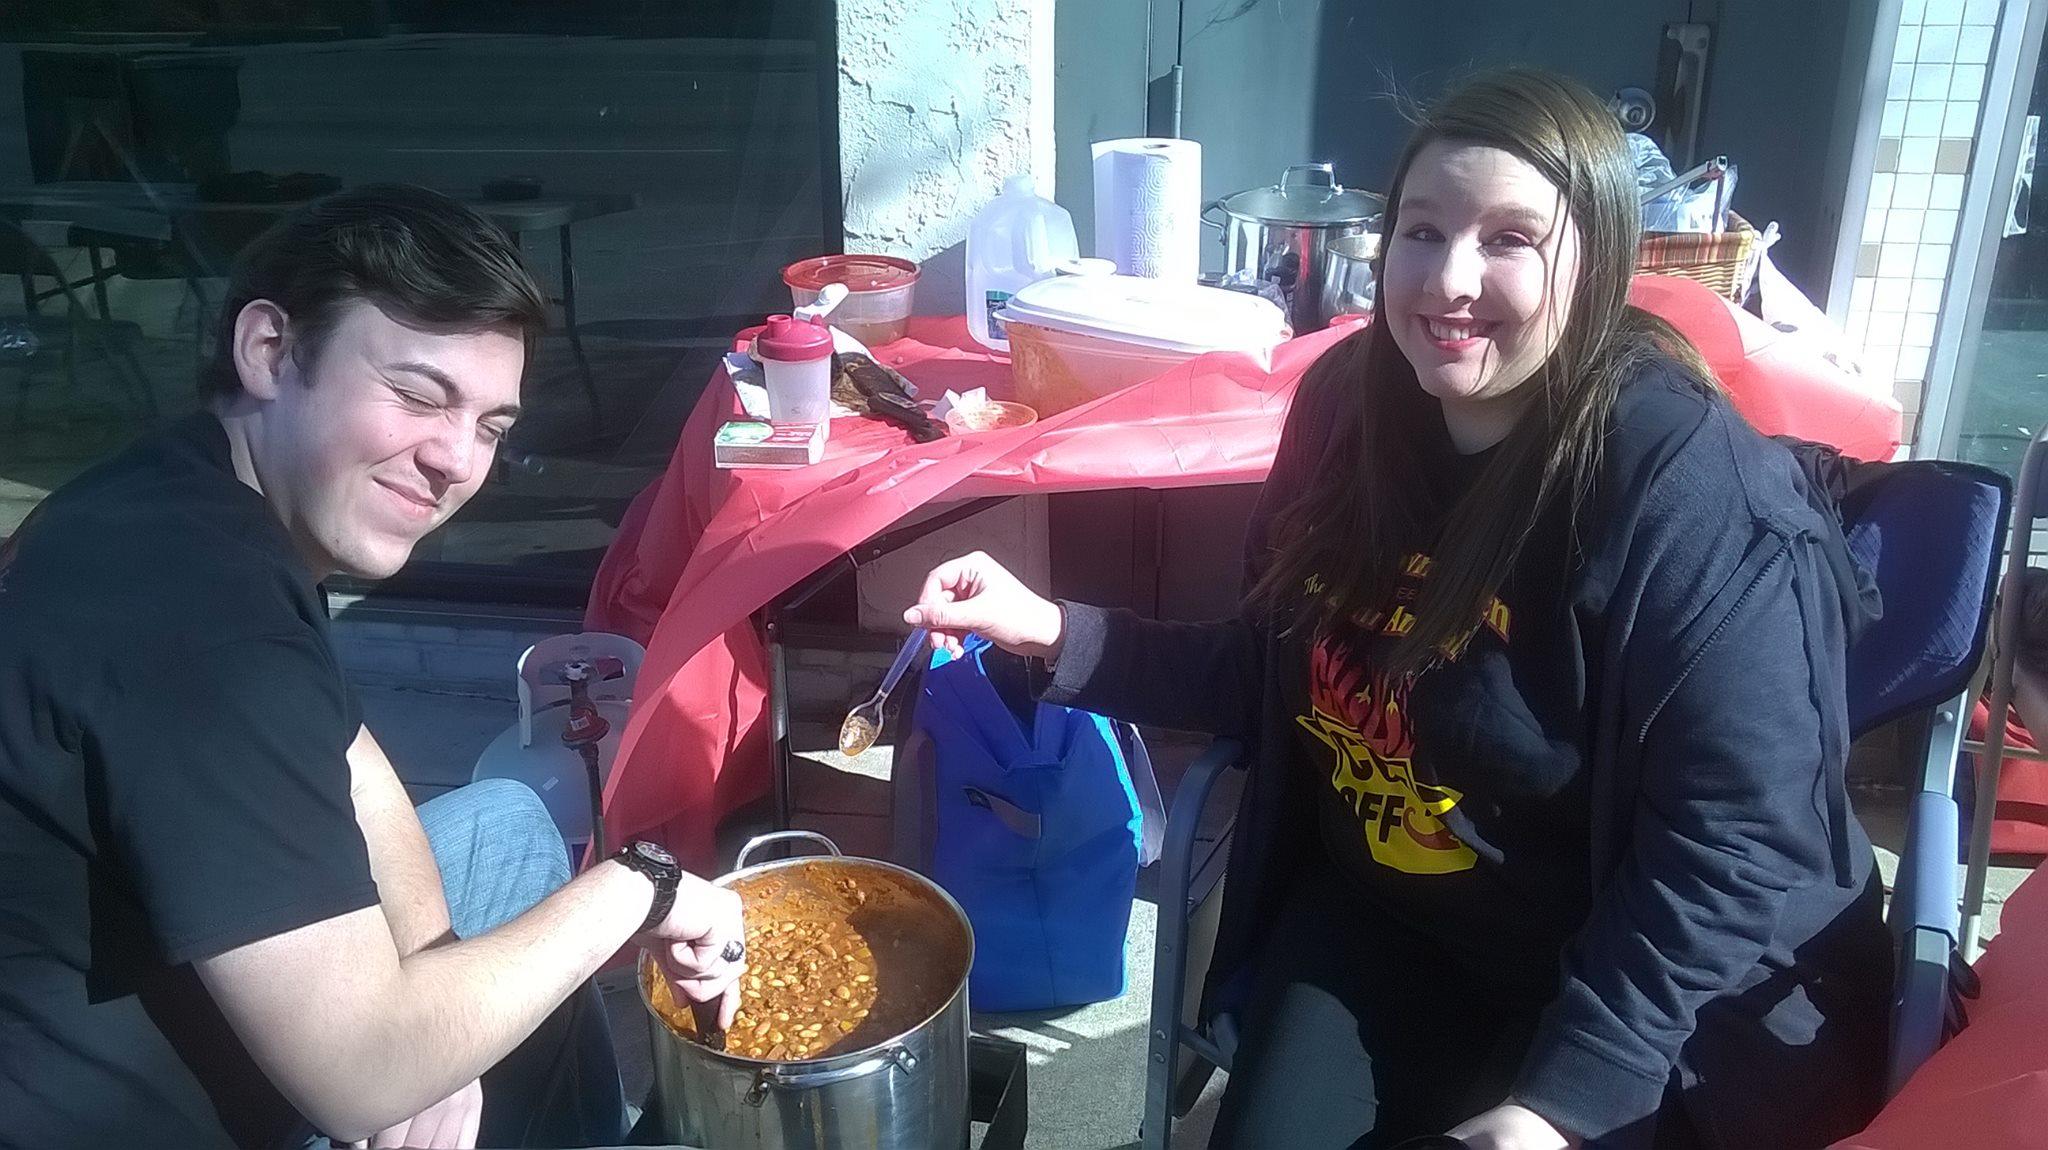 Gadsden Soup Kitchen